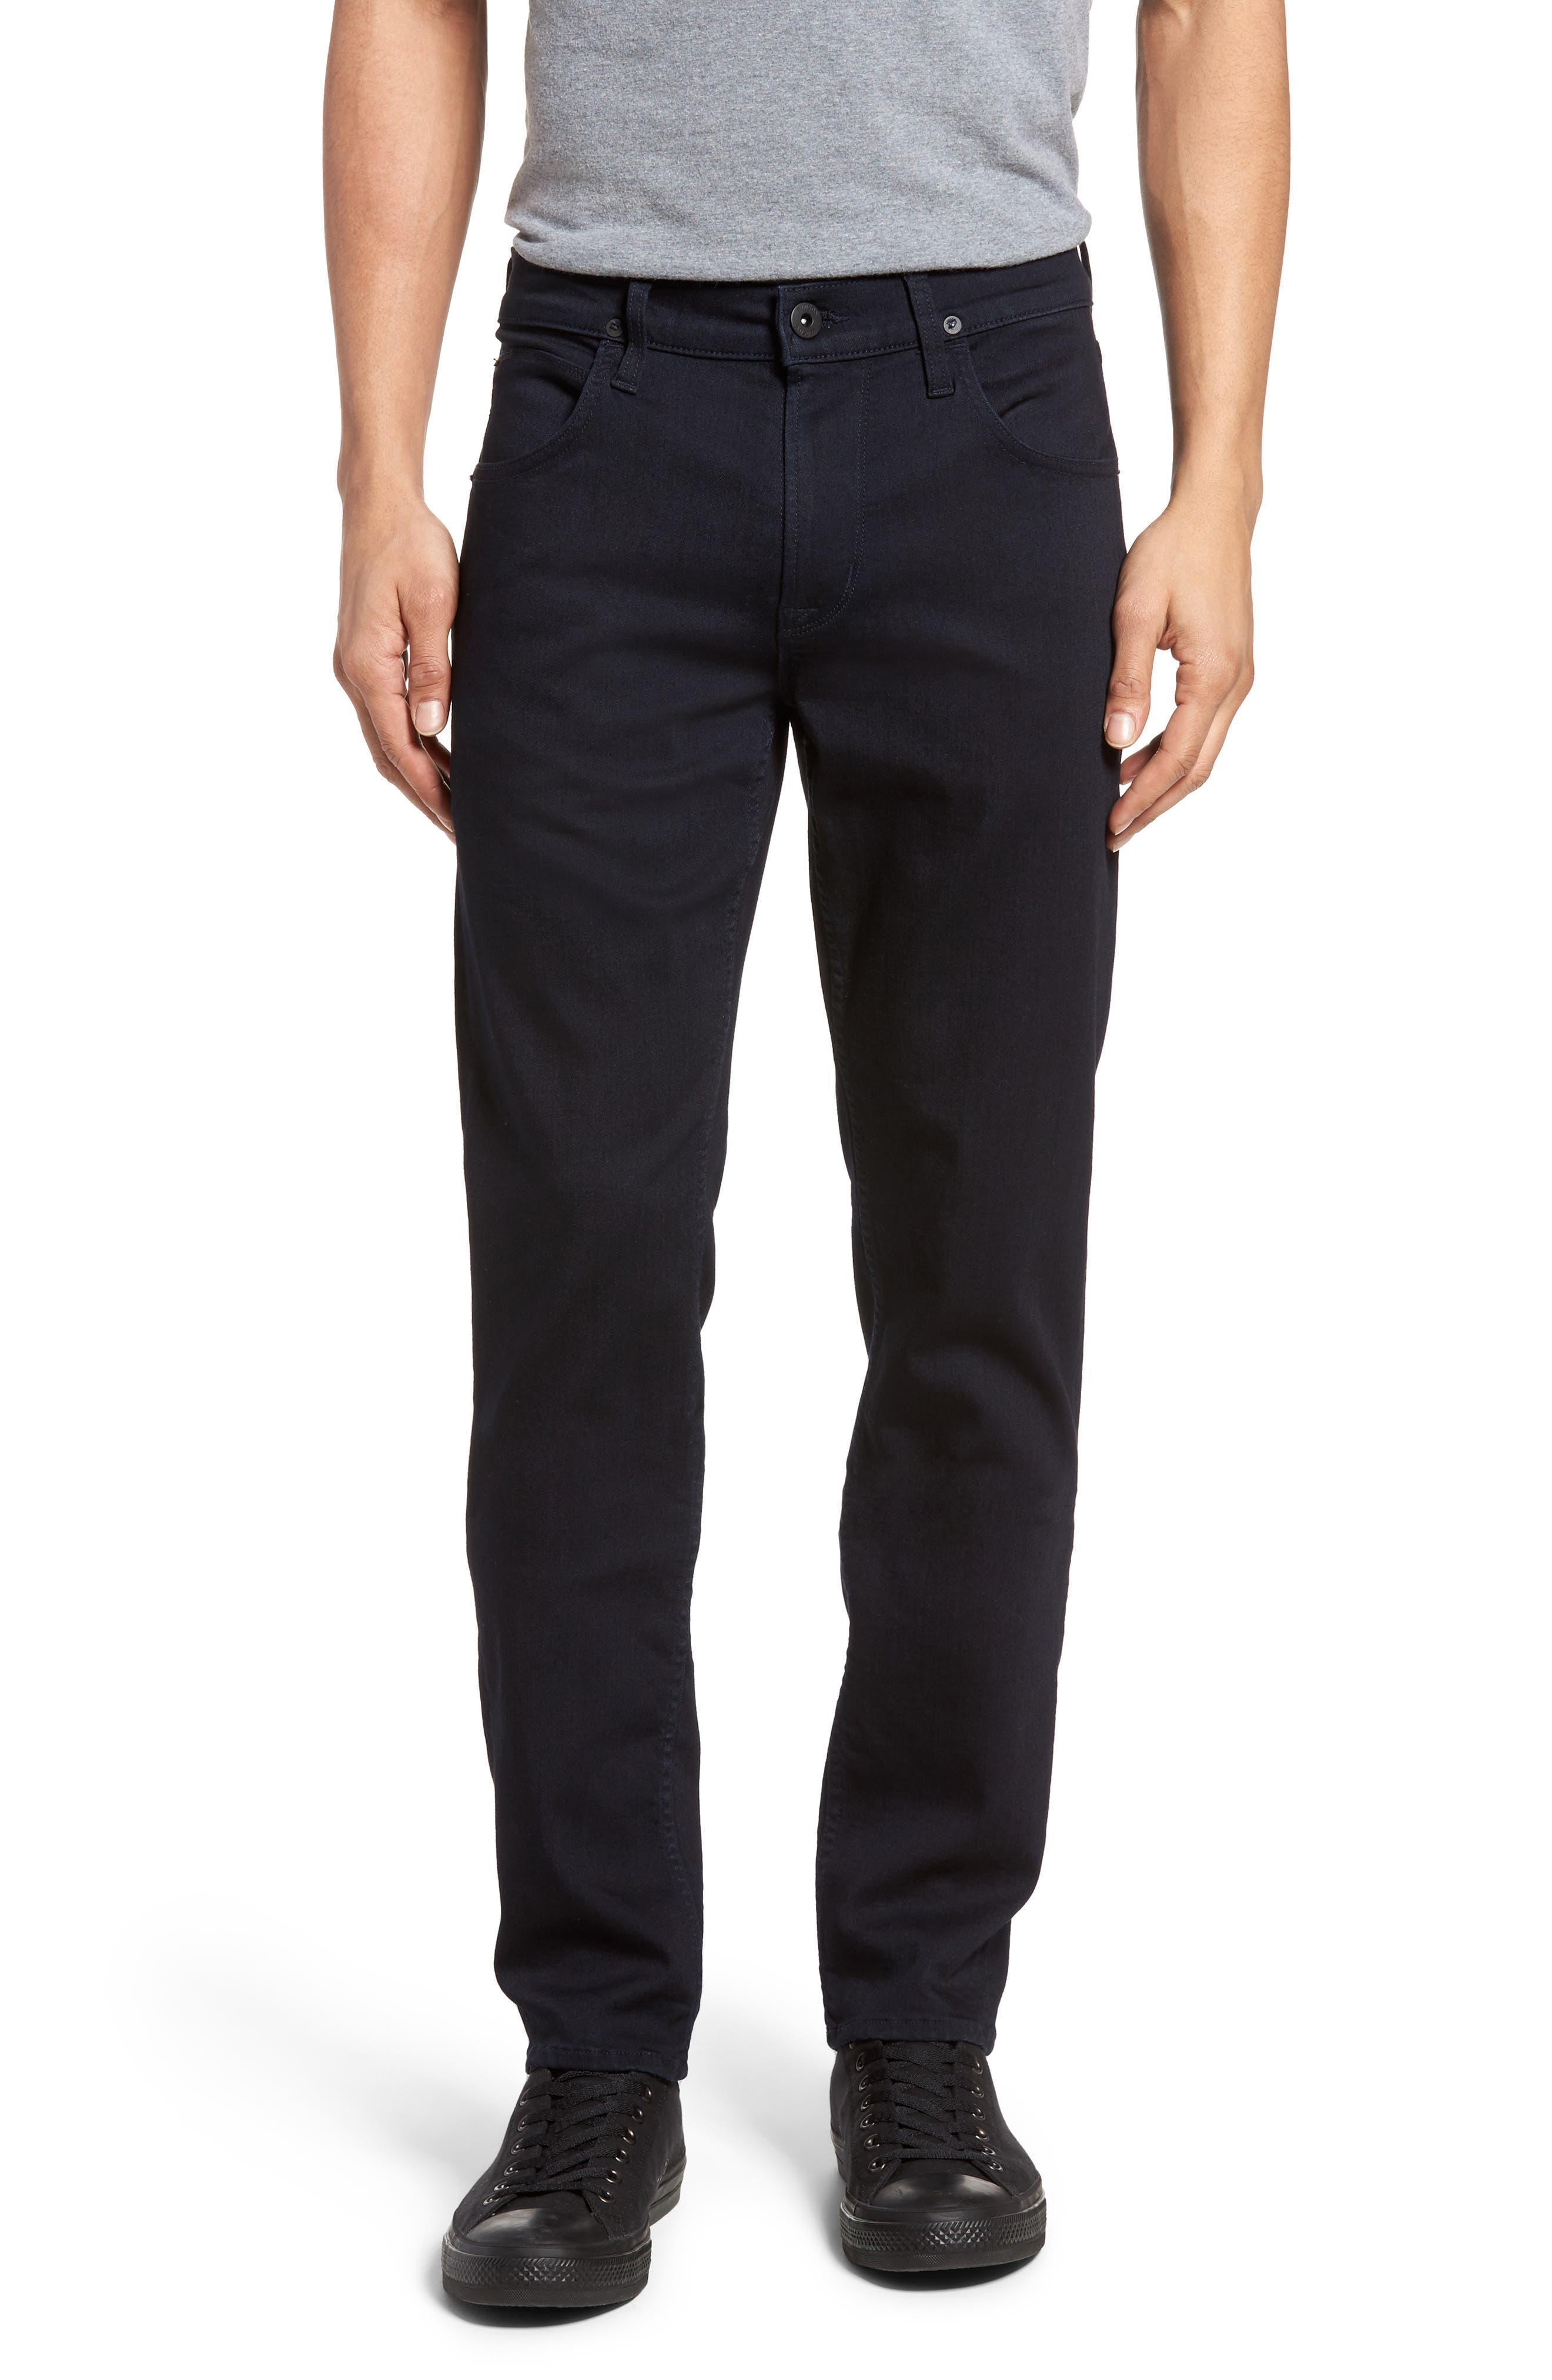 Blake Slim Fit Jeans,                             Main thumbnail 1, color,                             Hale Navy